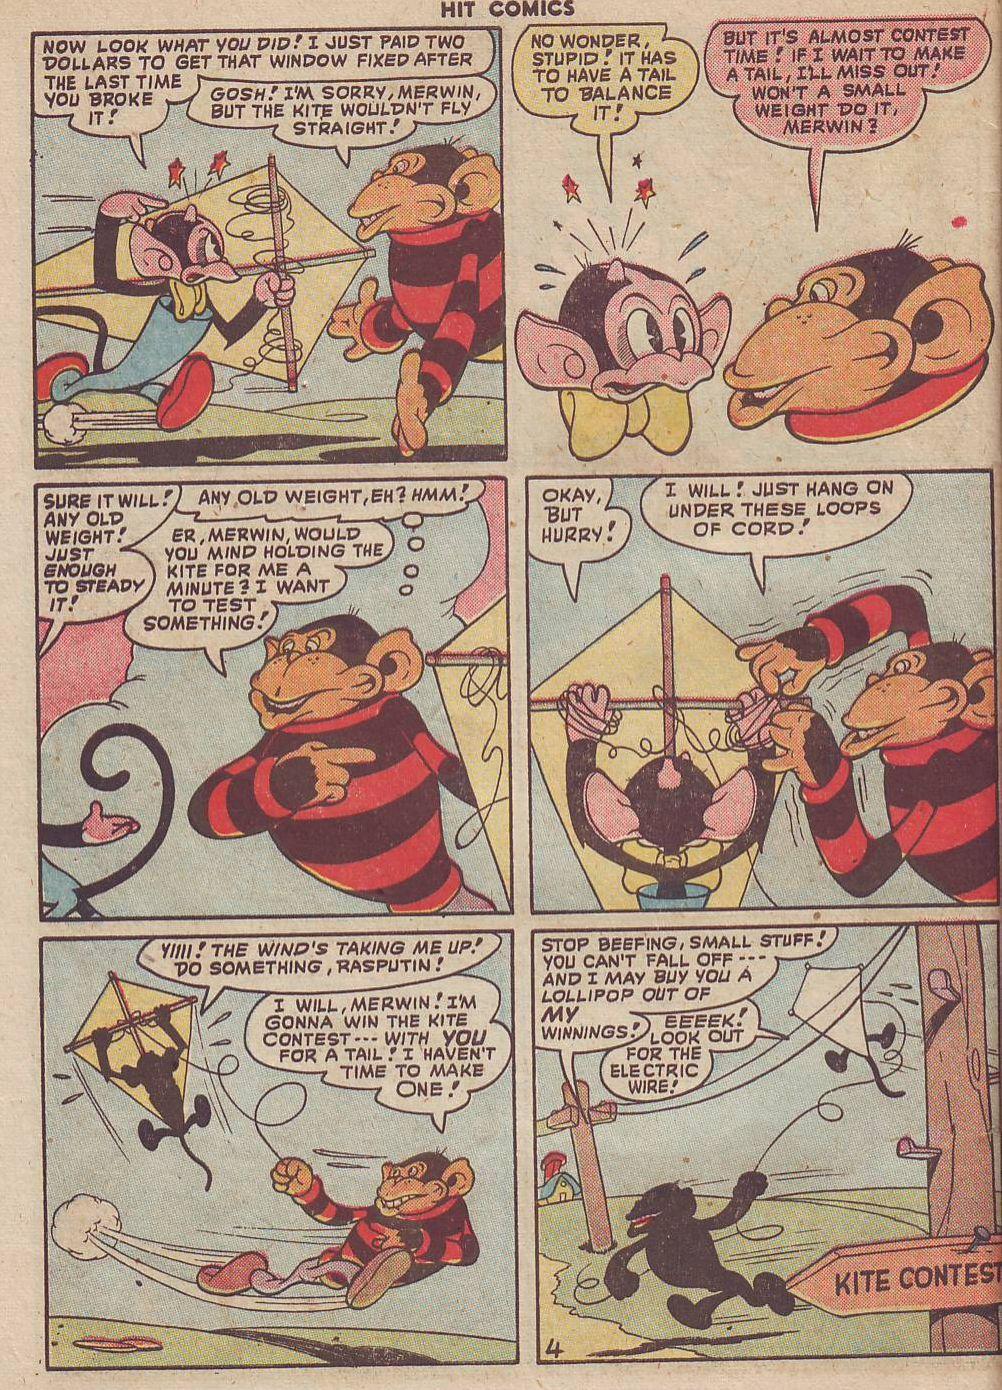 Read online Hit Comics comic -  Issue #51 - 48